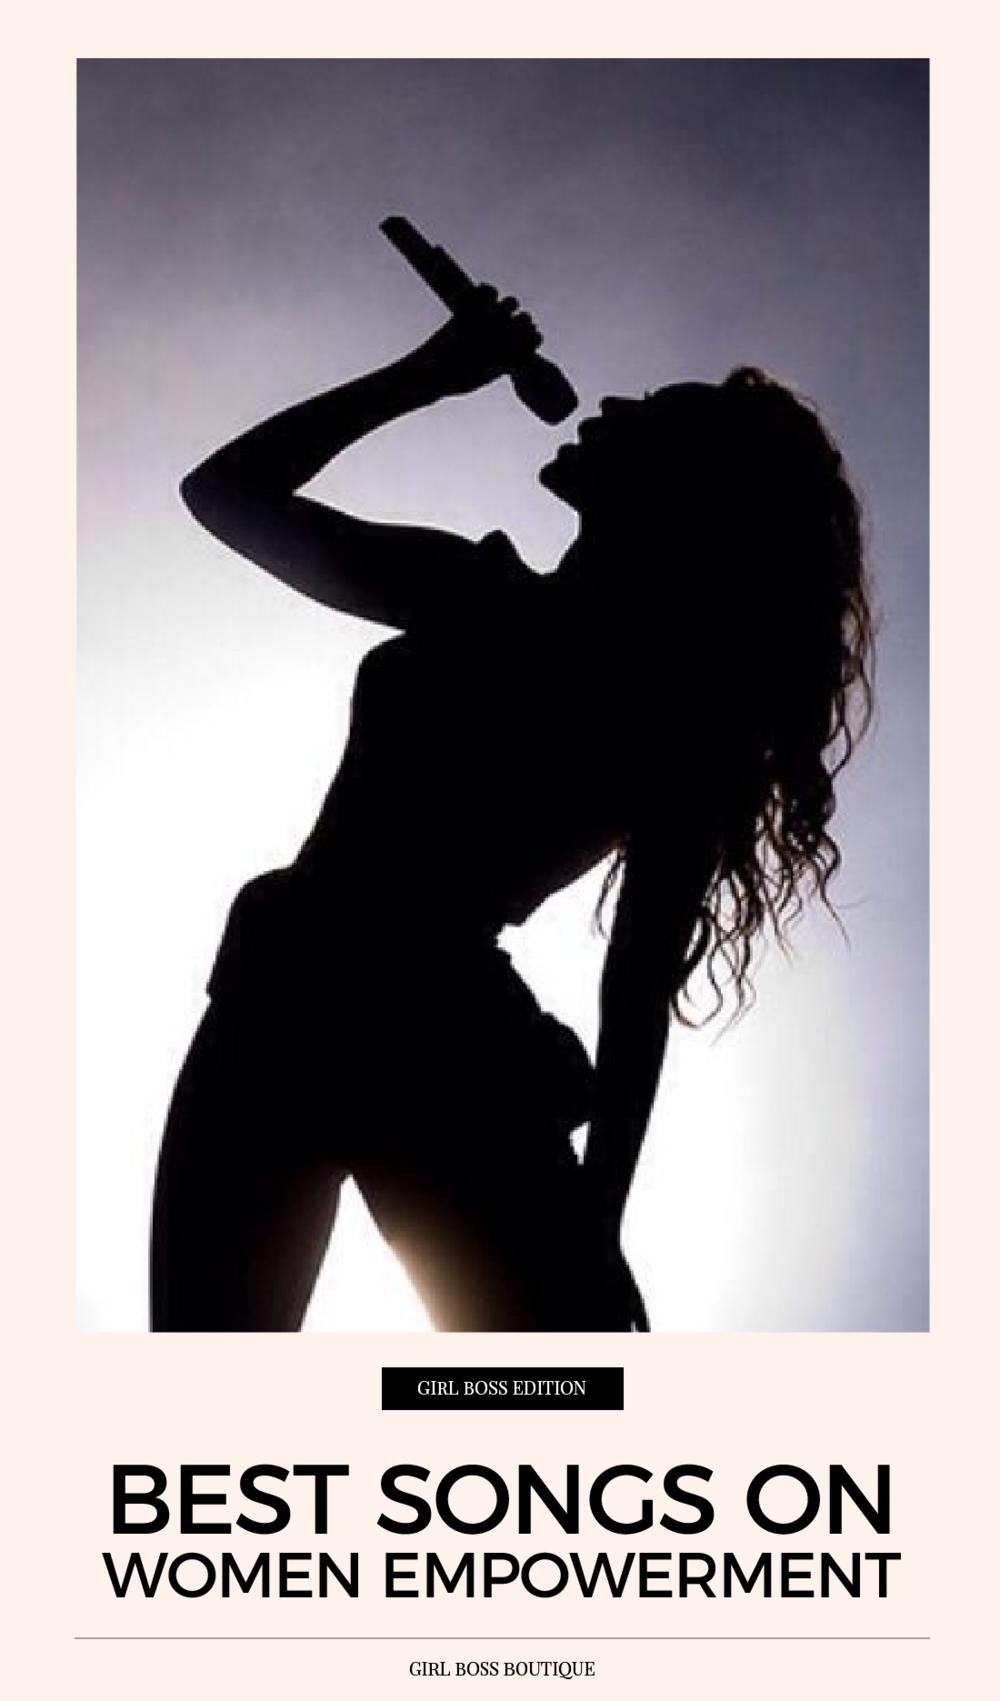 Best songs on women empowerment